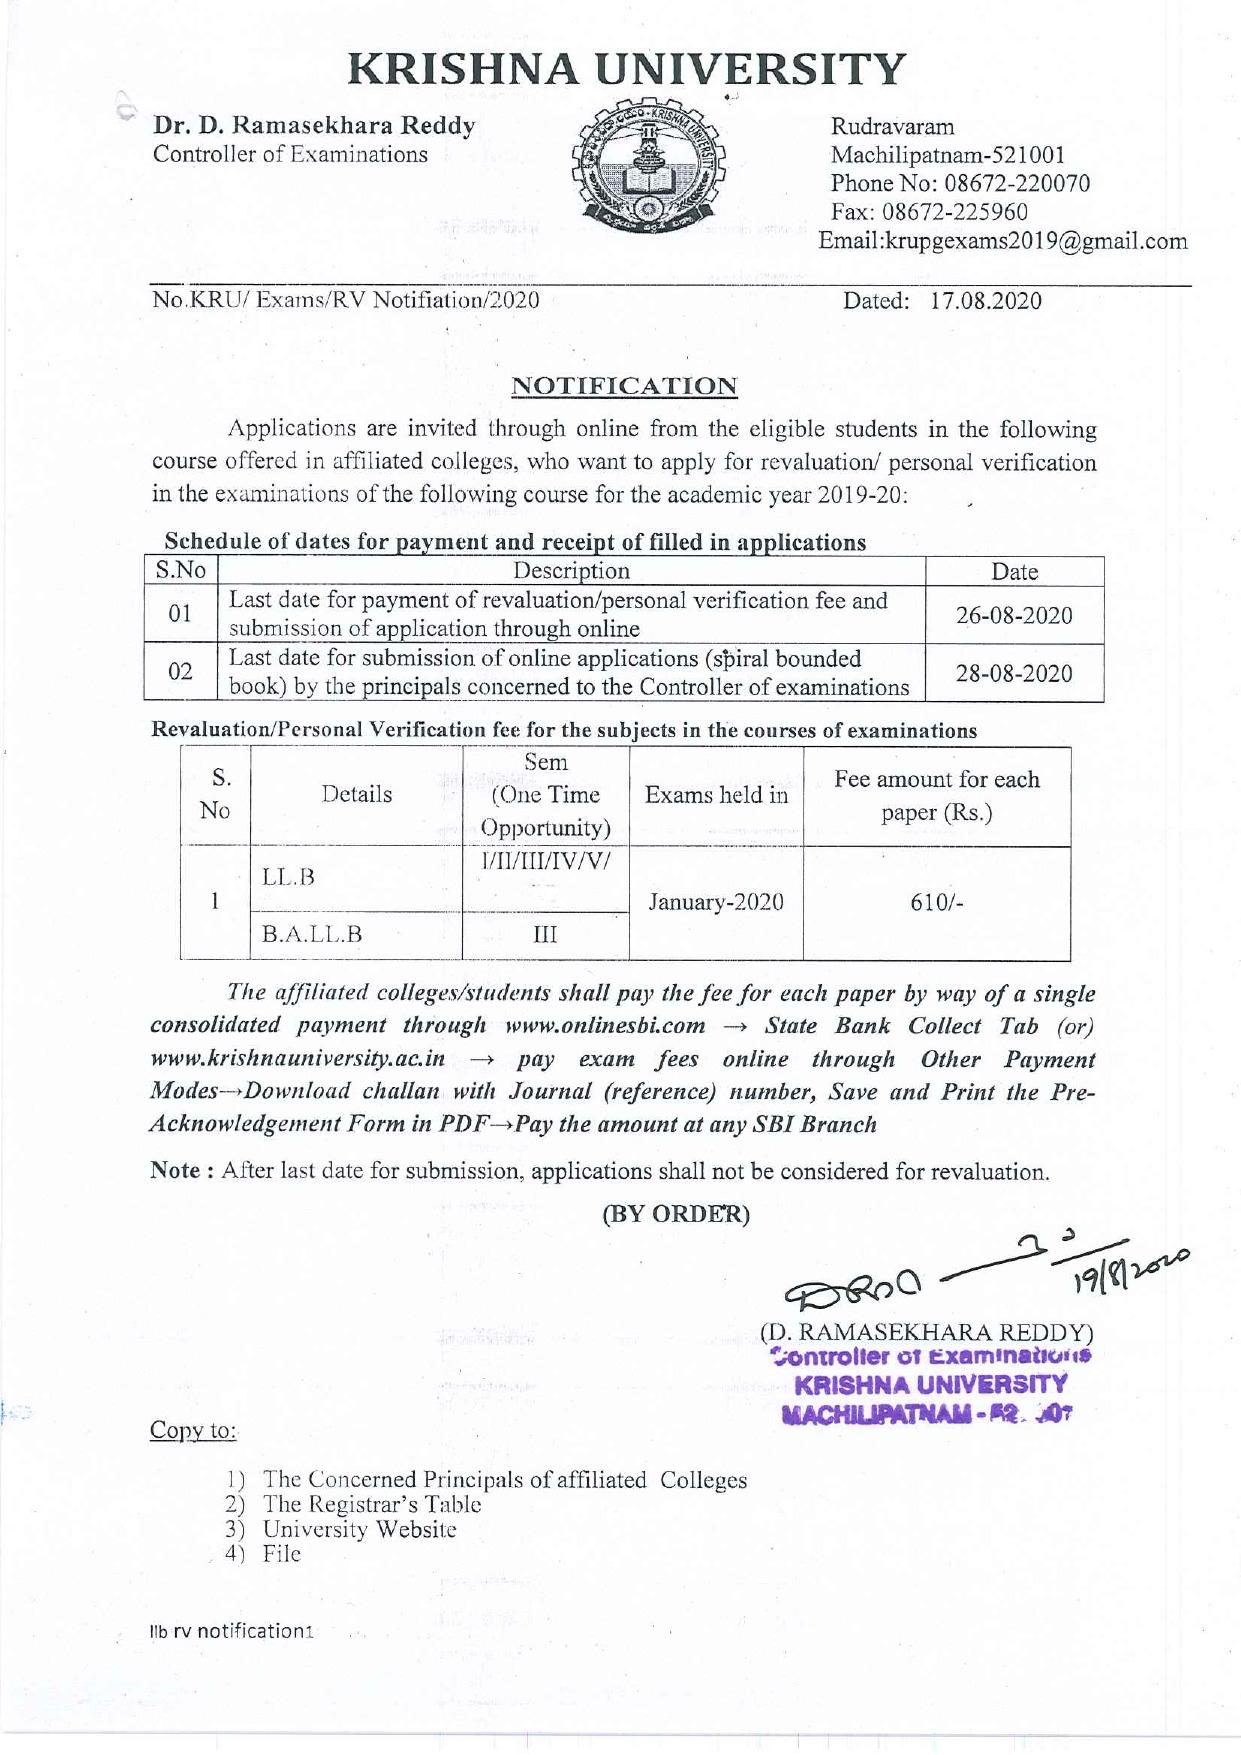 Krishna University LLB & BALLB One Time Opportunity Jan 2020 Revaluation Fee Notification